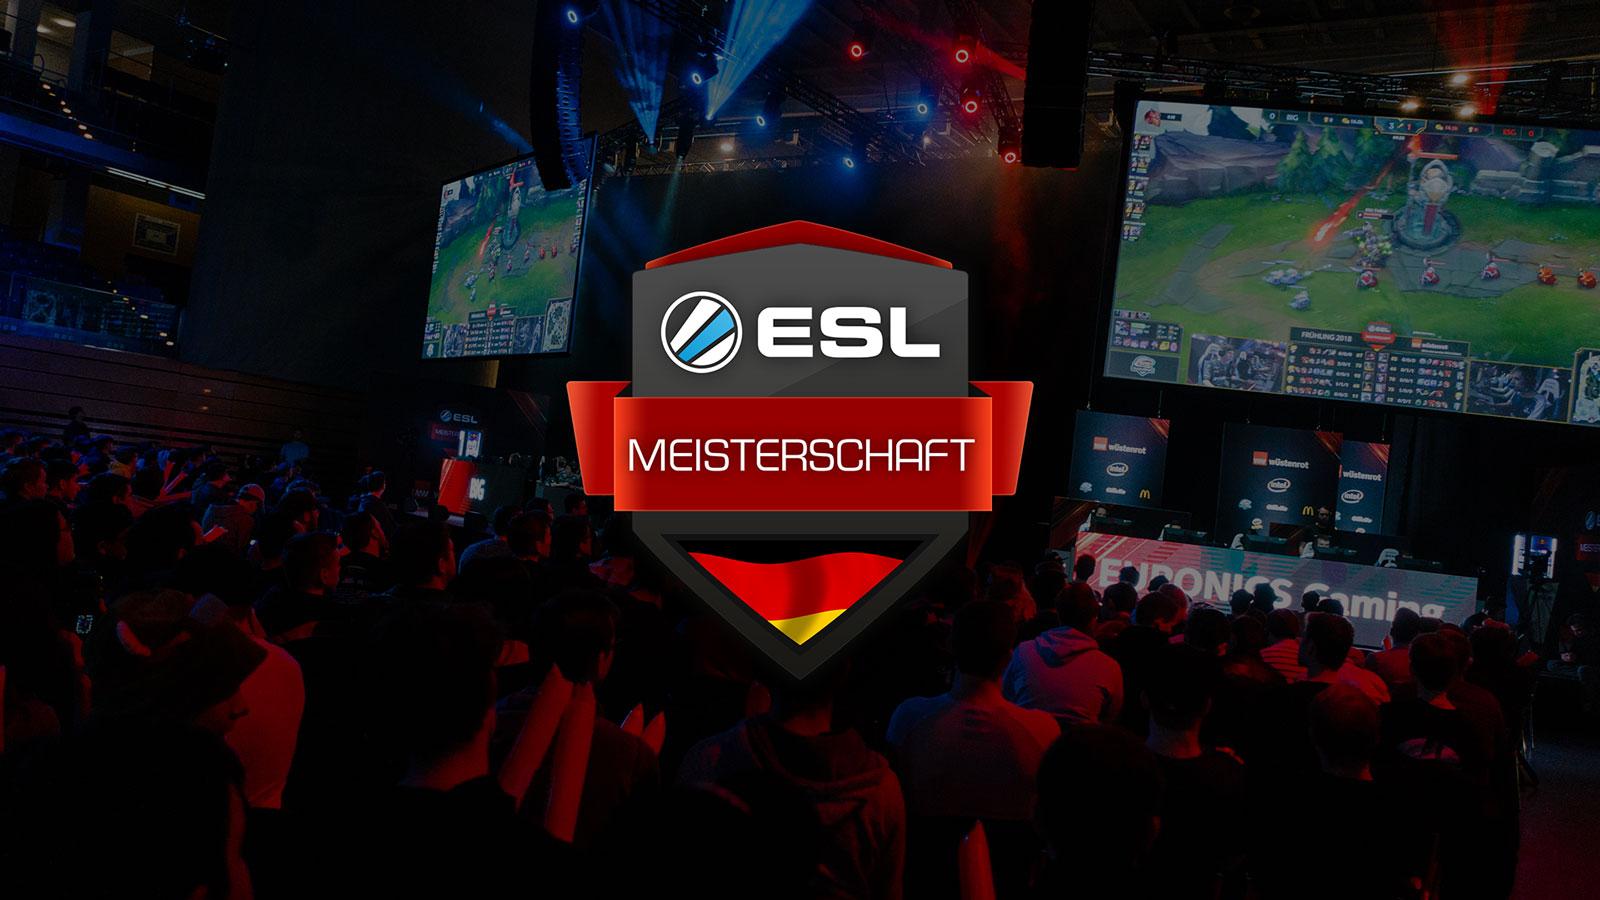 ESL Sommermeisterschaft 2018 CS:GO